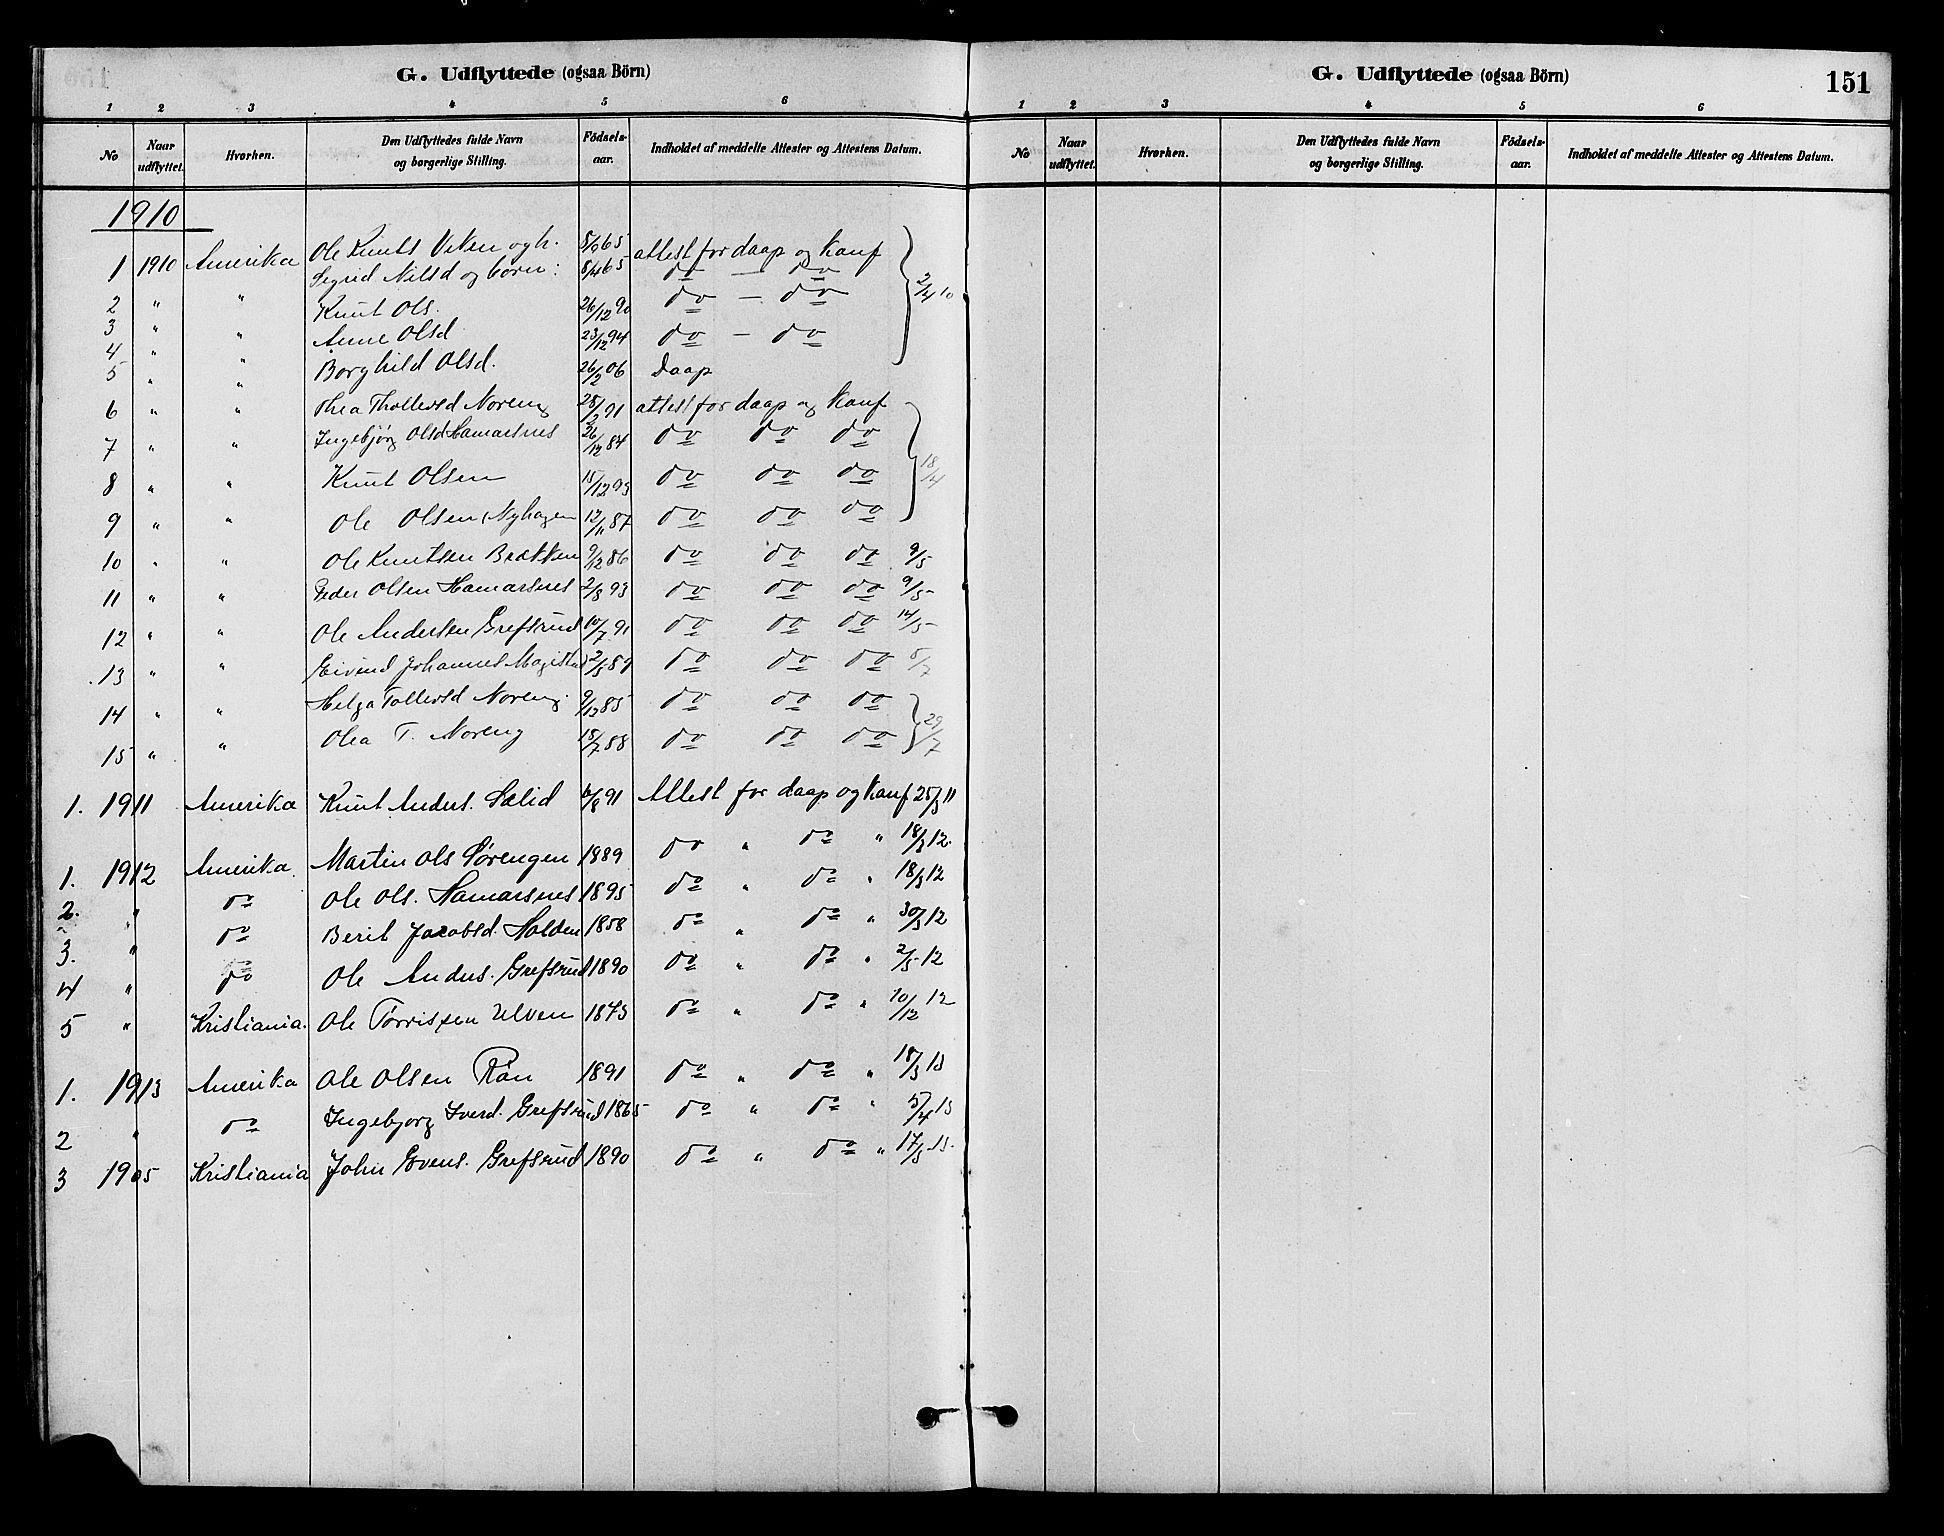 SAH, Vestre Slidre prestekontor, Klokkerbok nr. 5, 1881-1913, s. 151